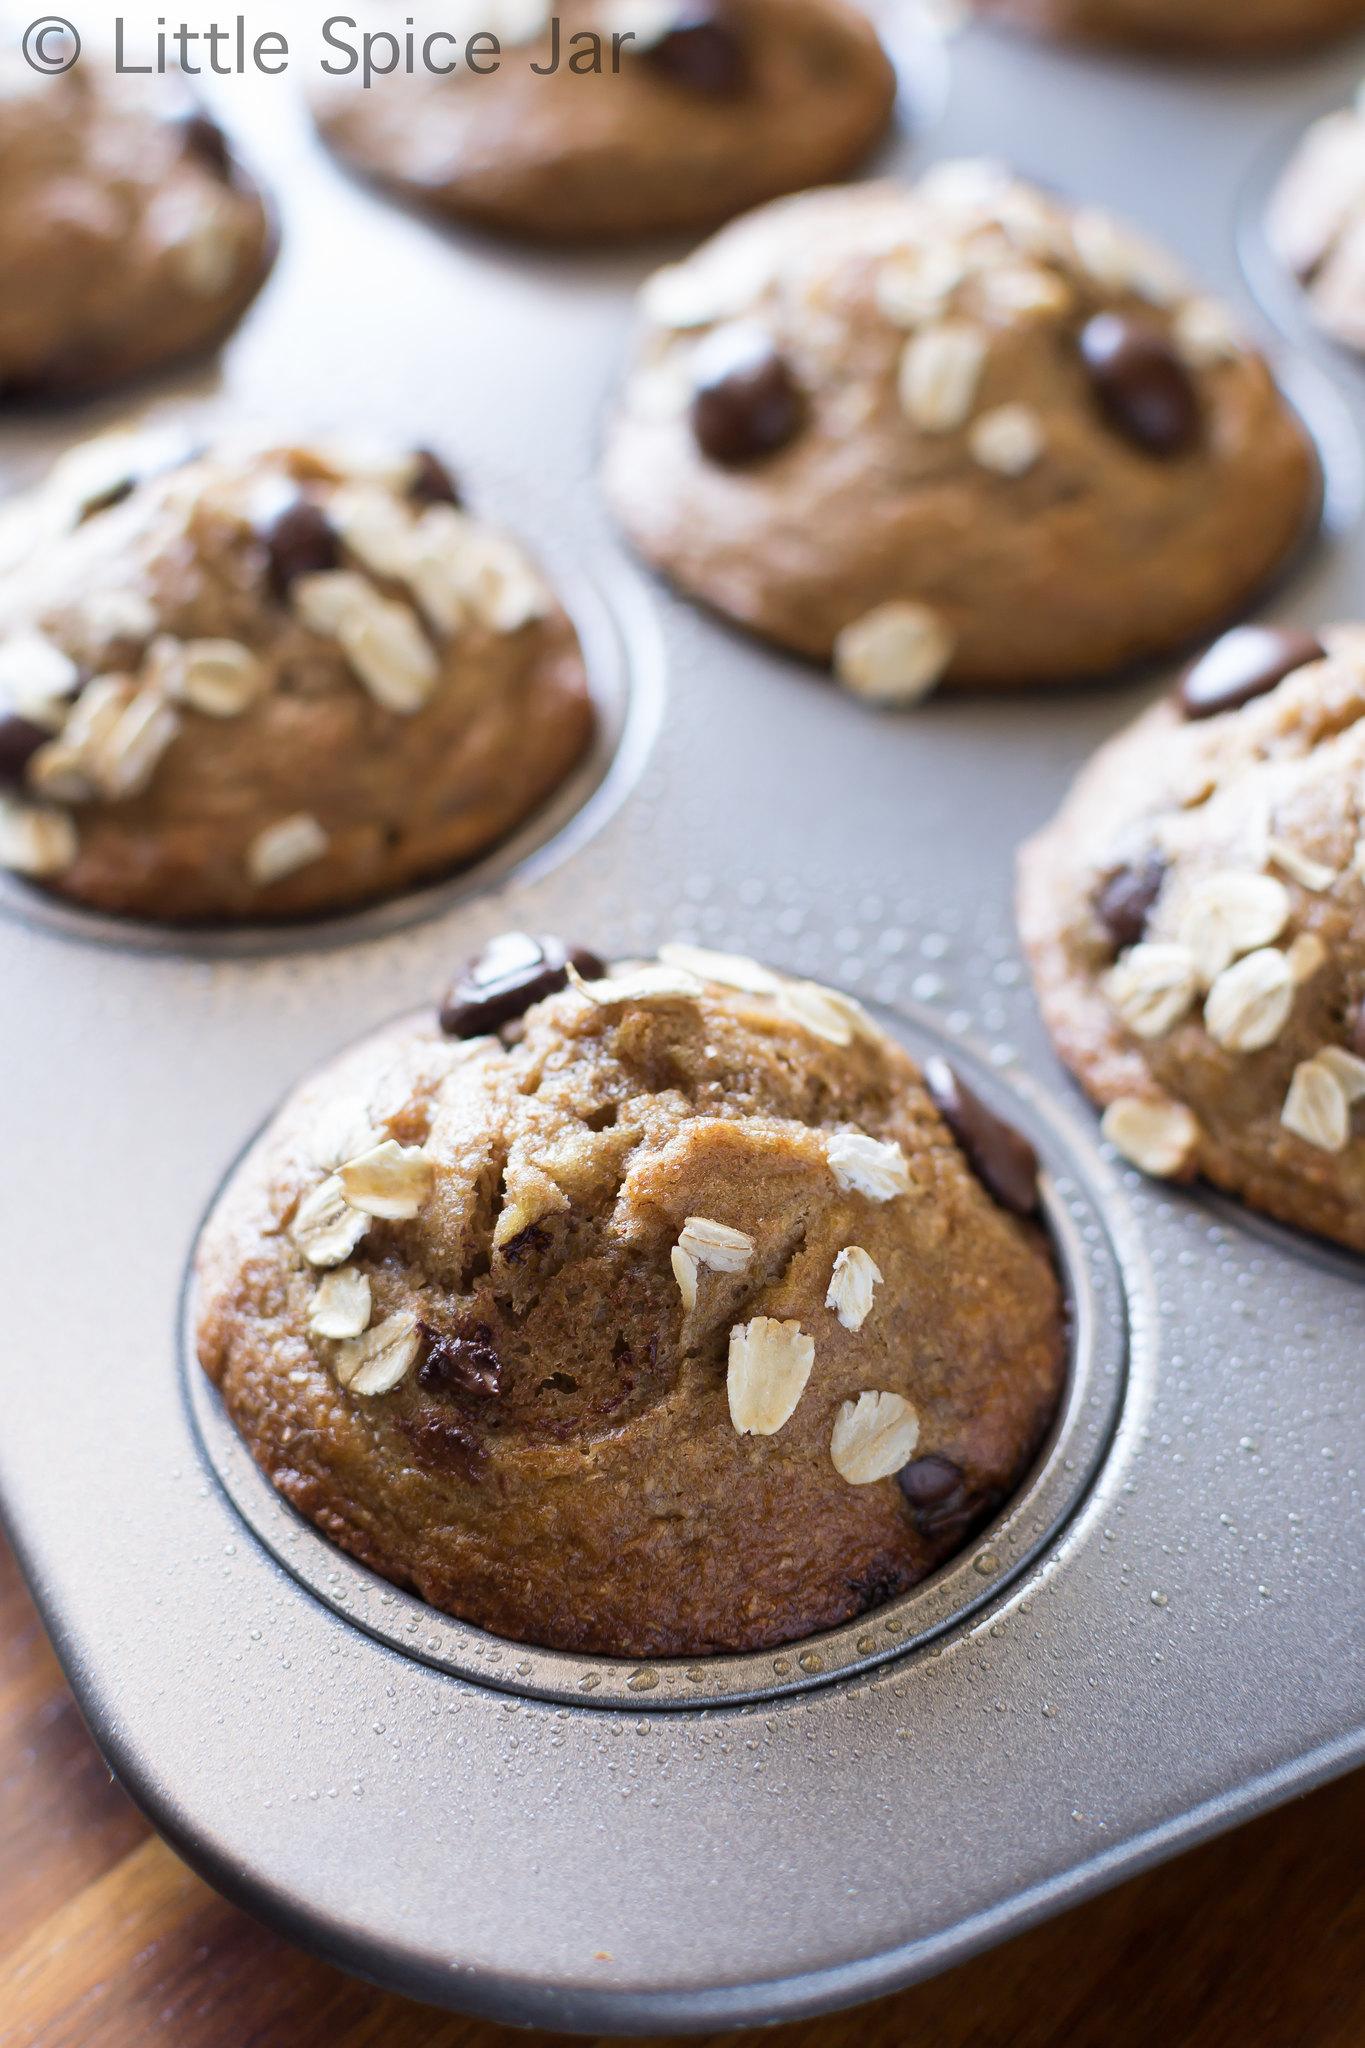 prepared banana muffins on baking pan